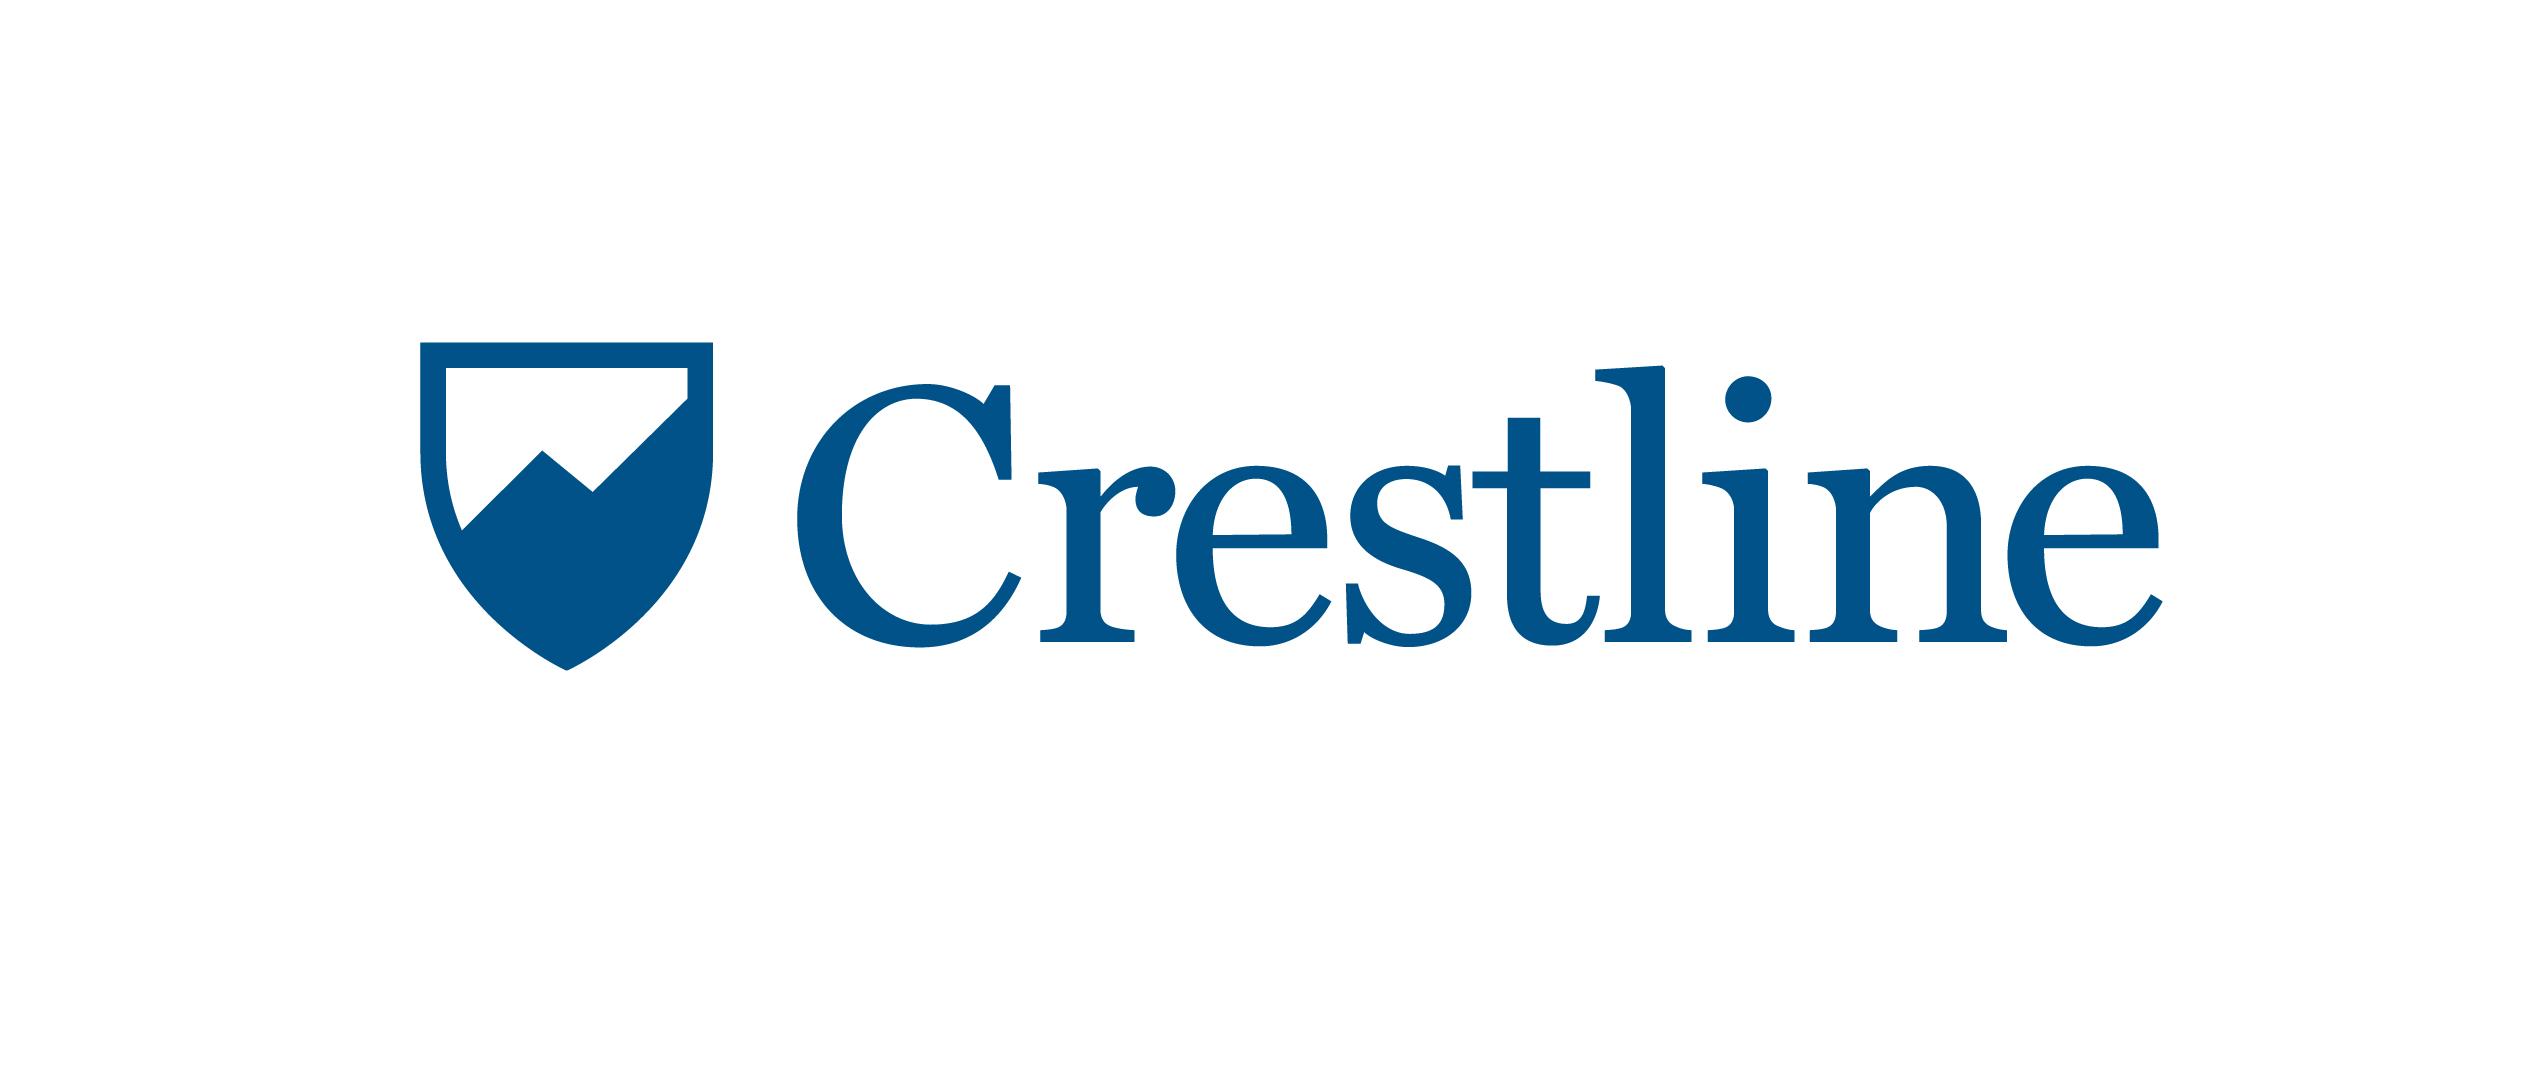 Crest line